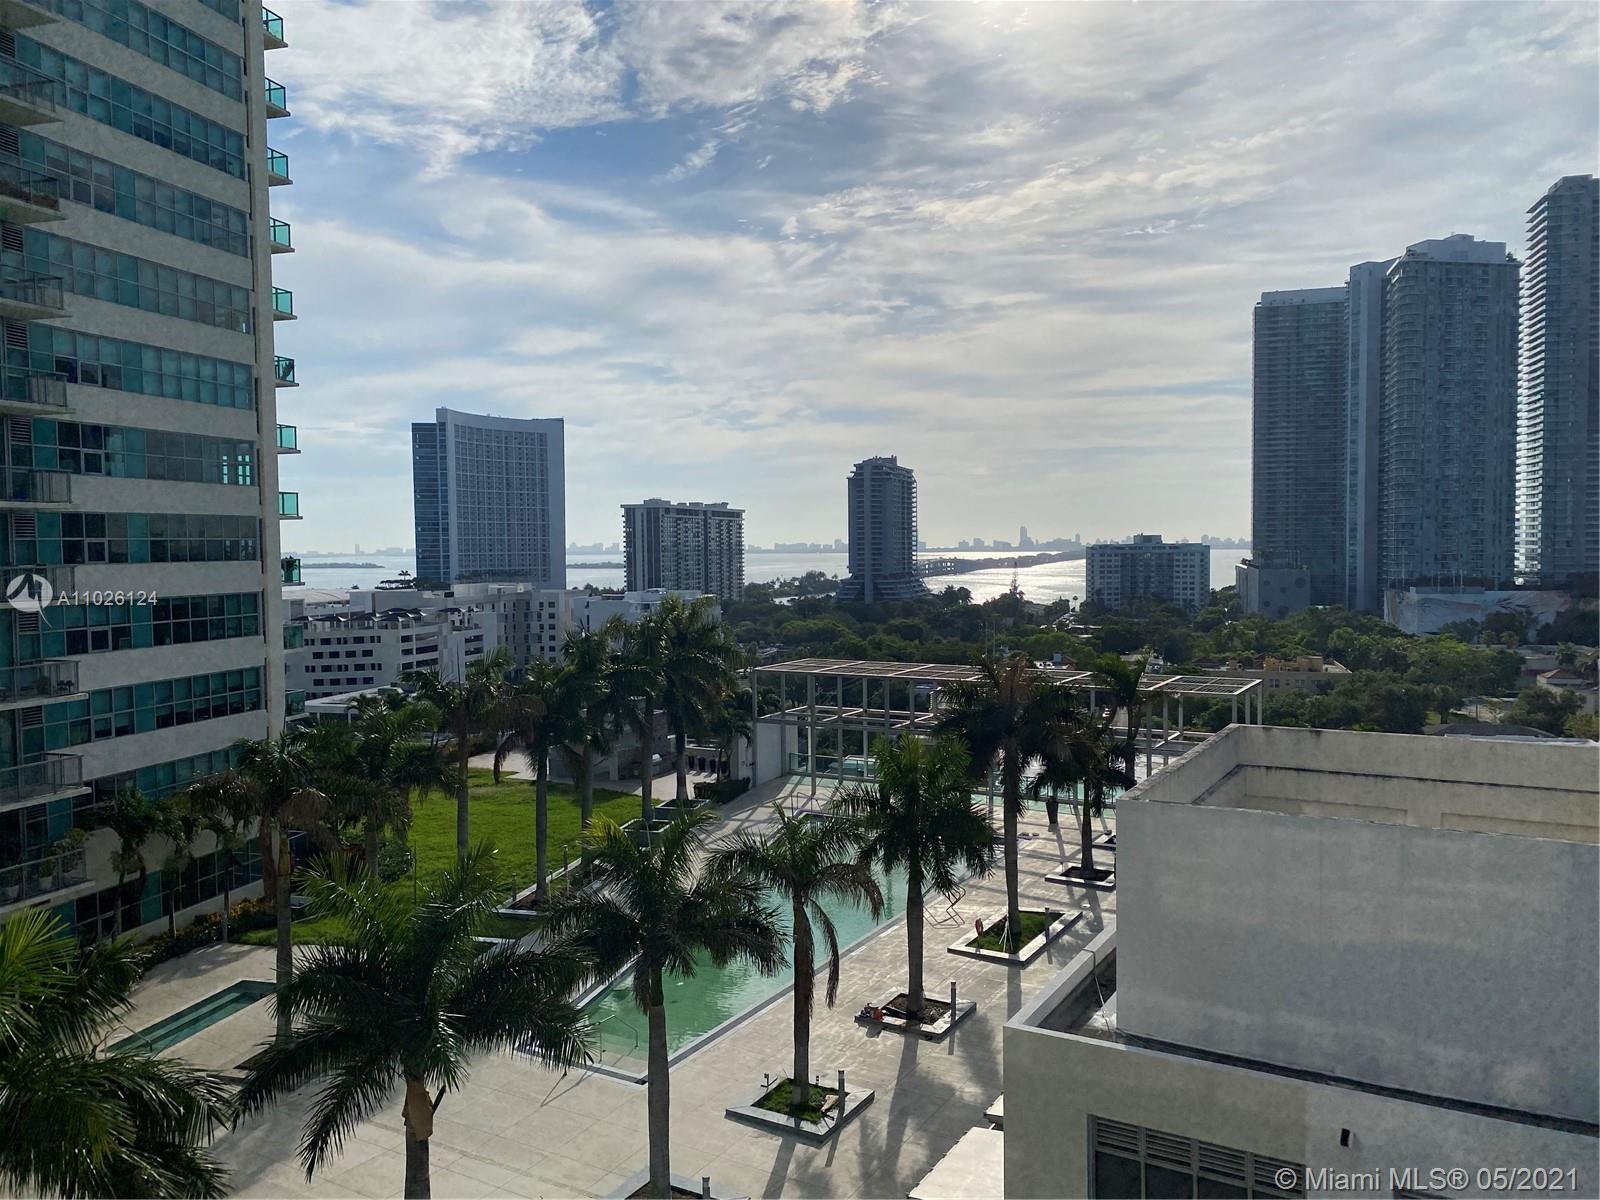 4 Midtown #H1102 - 3301 NE 1st Ave #H1102, Miami, FL 33137